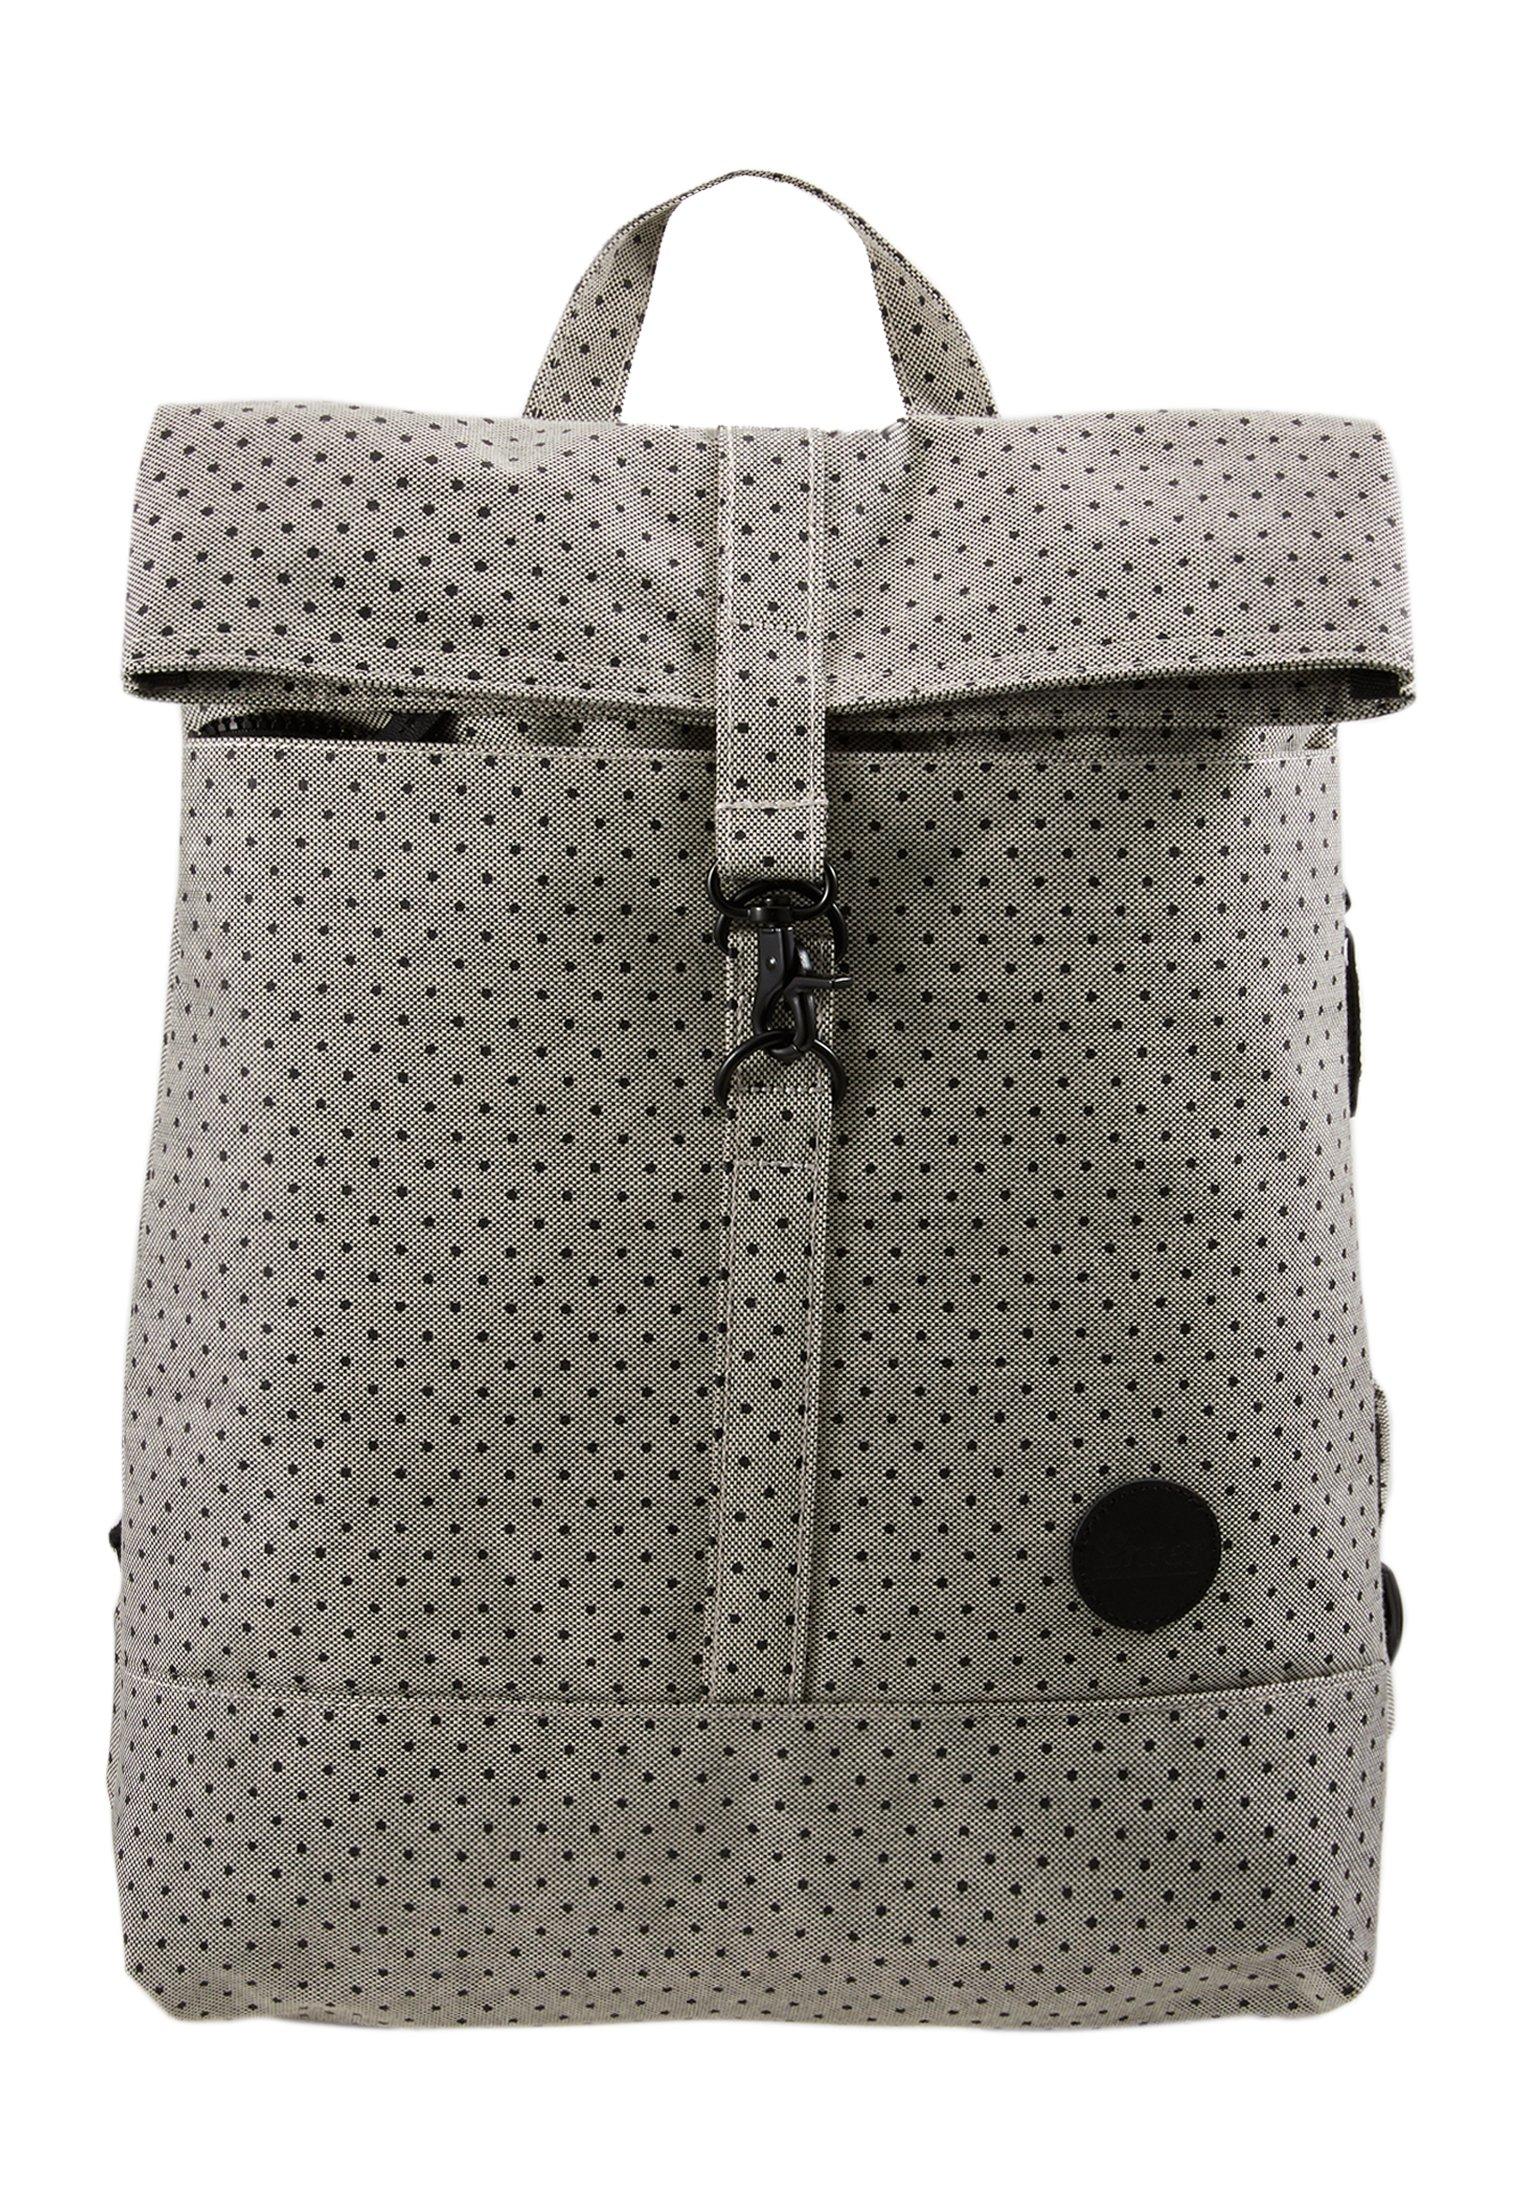 Enter City Fold Top Backpack - Rugzak Melange Black/black Polkadot B6n2u6t